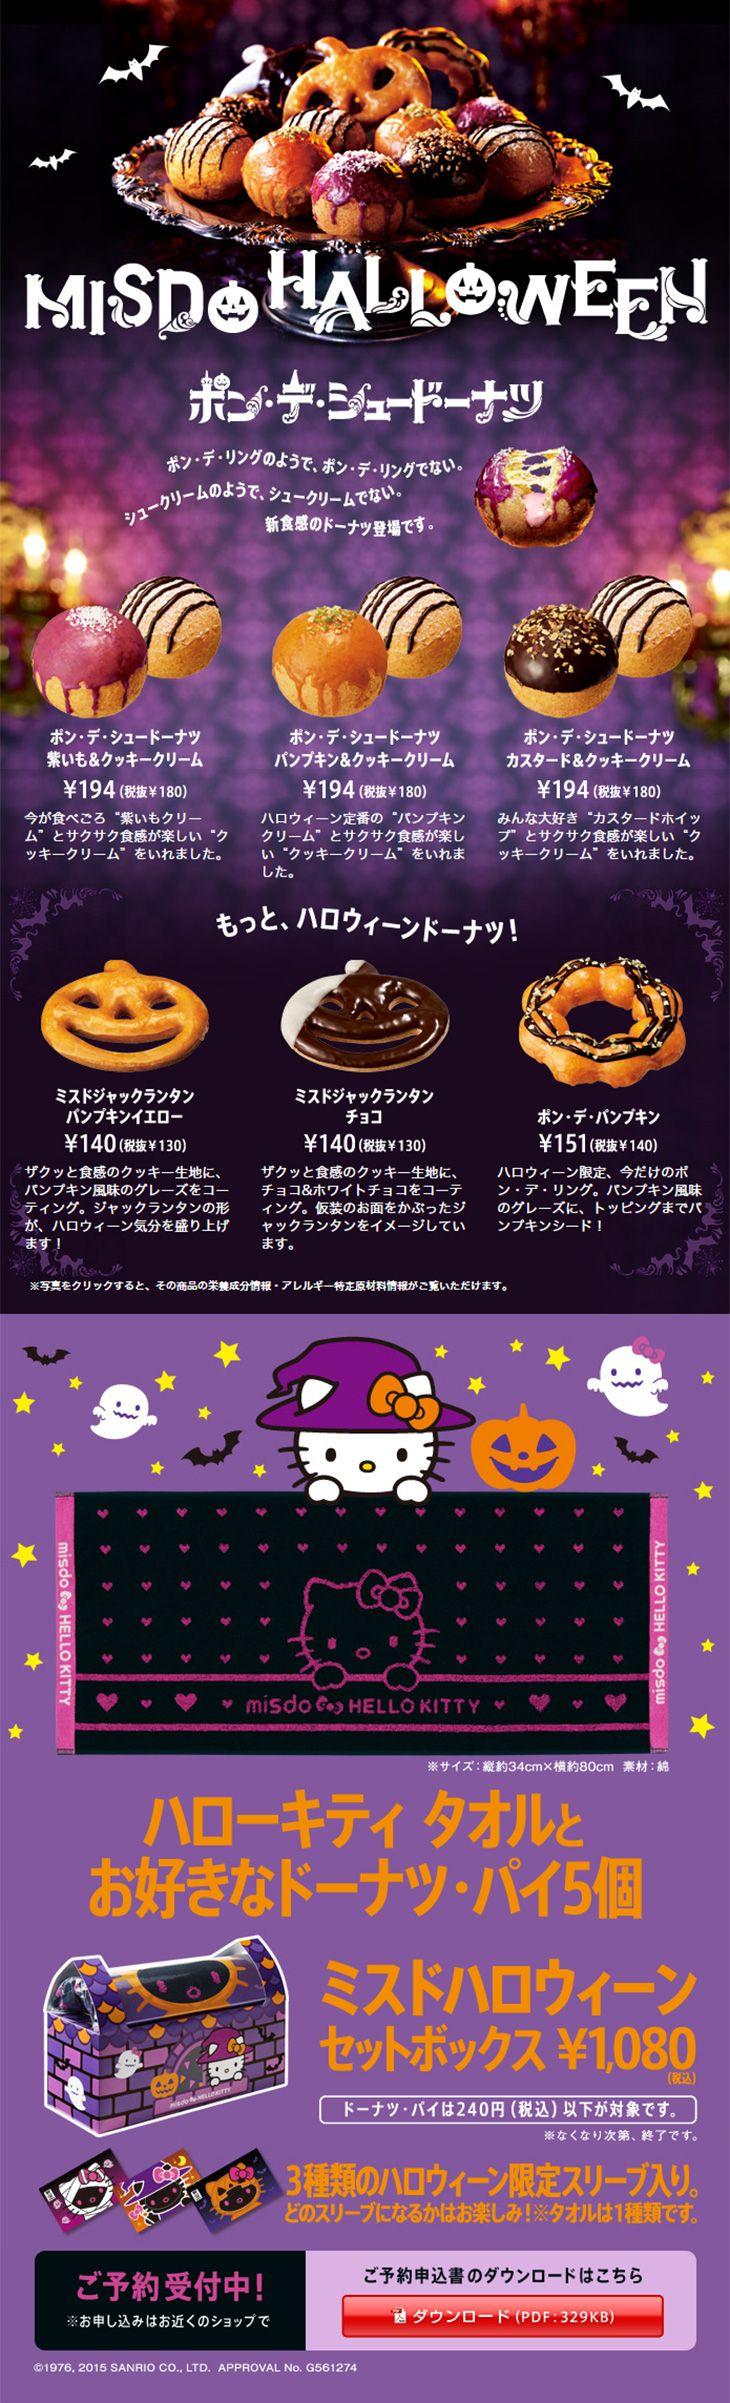 Misdo Halloween?